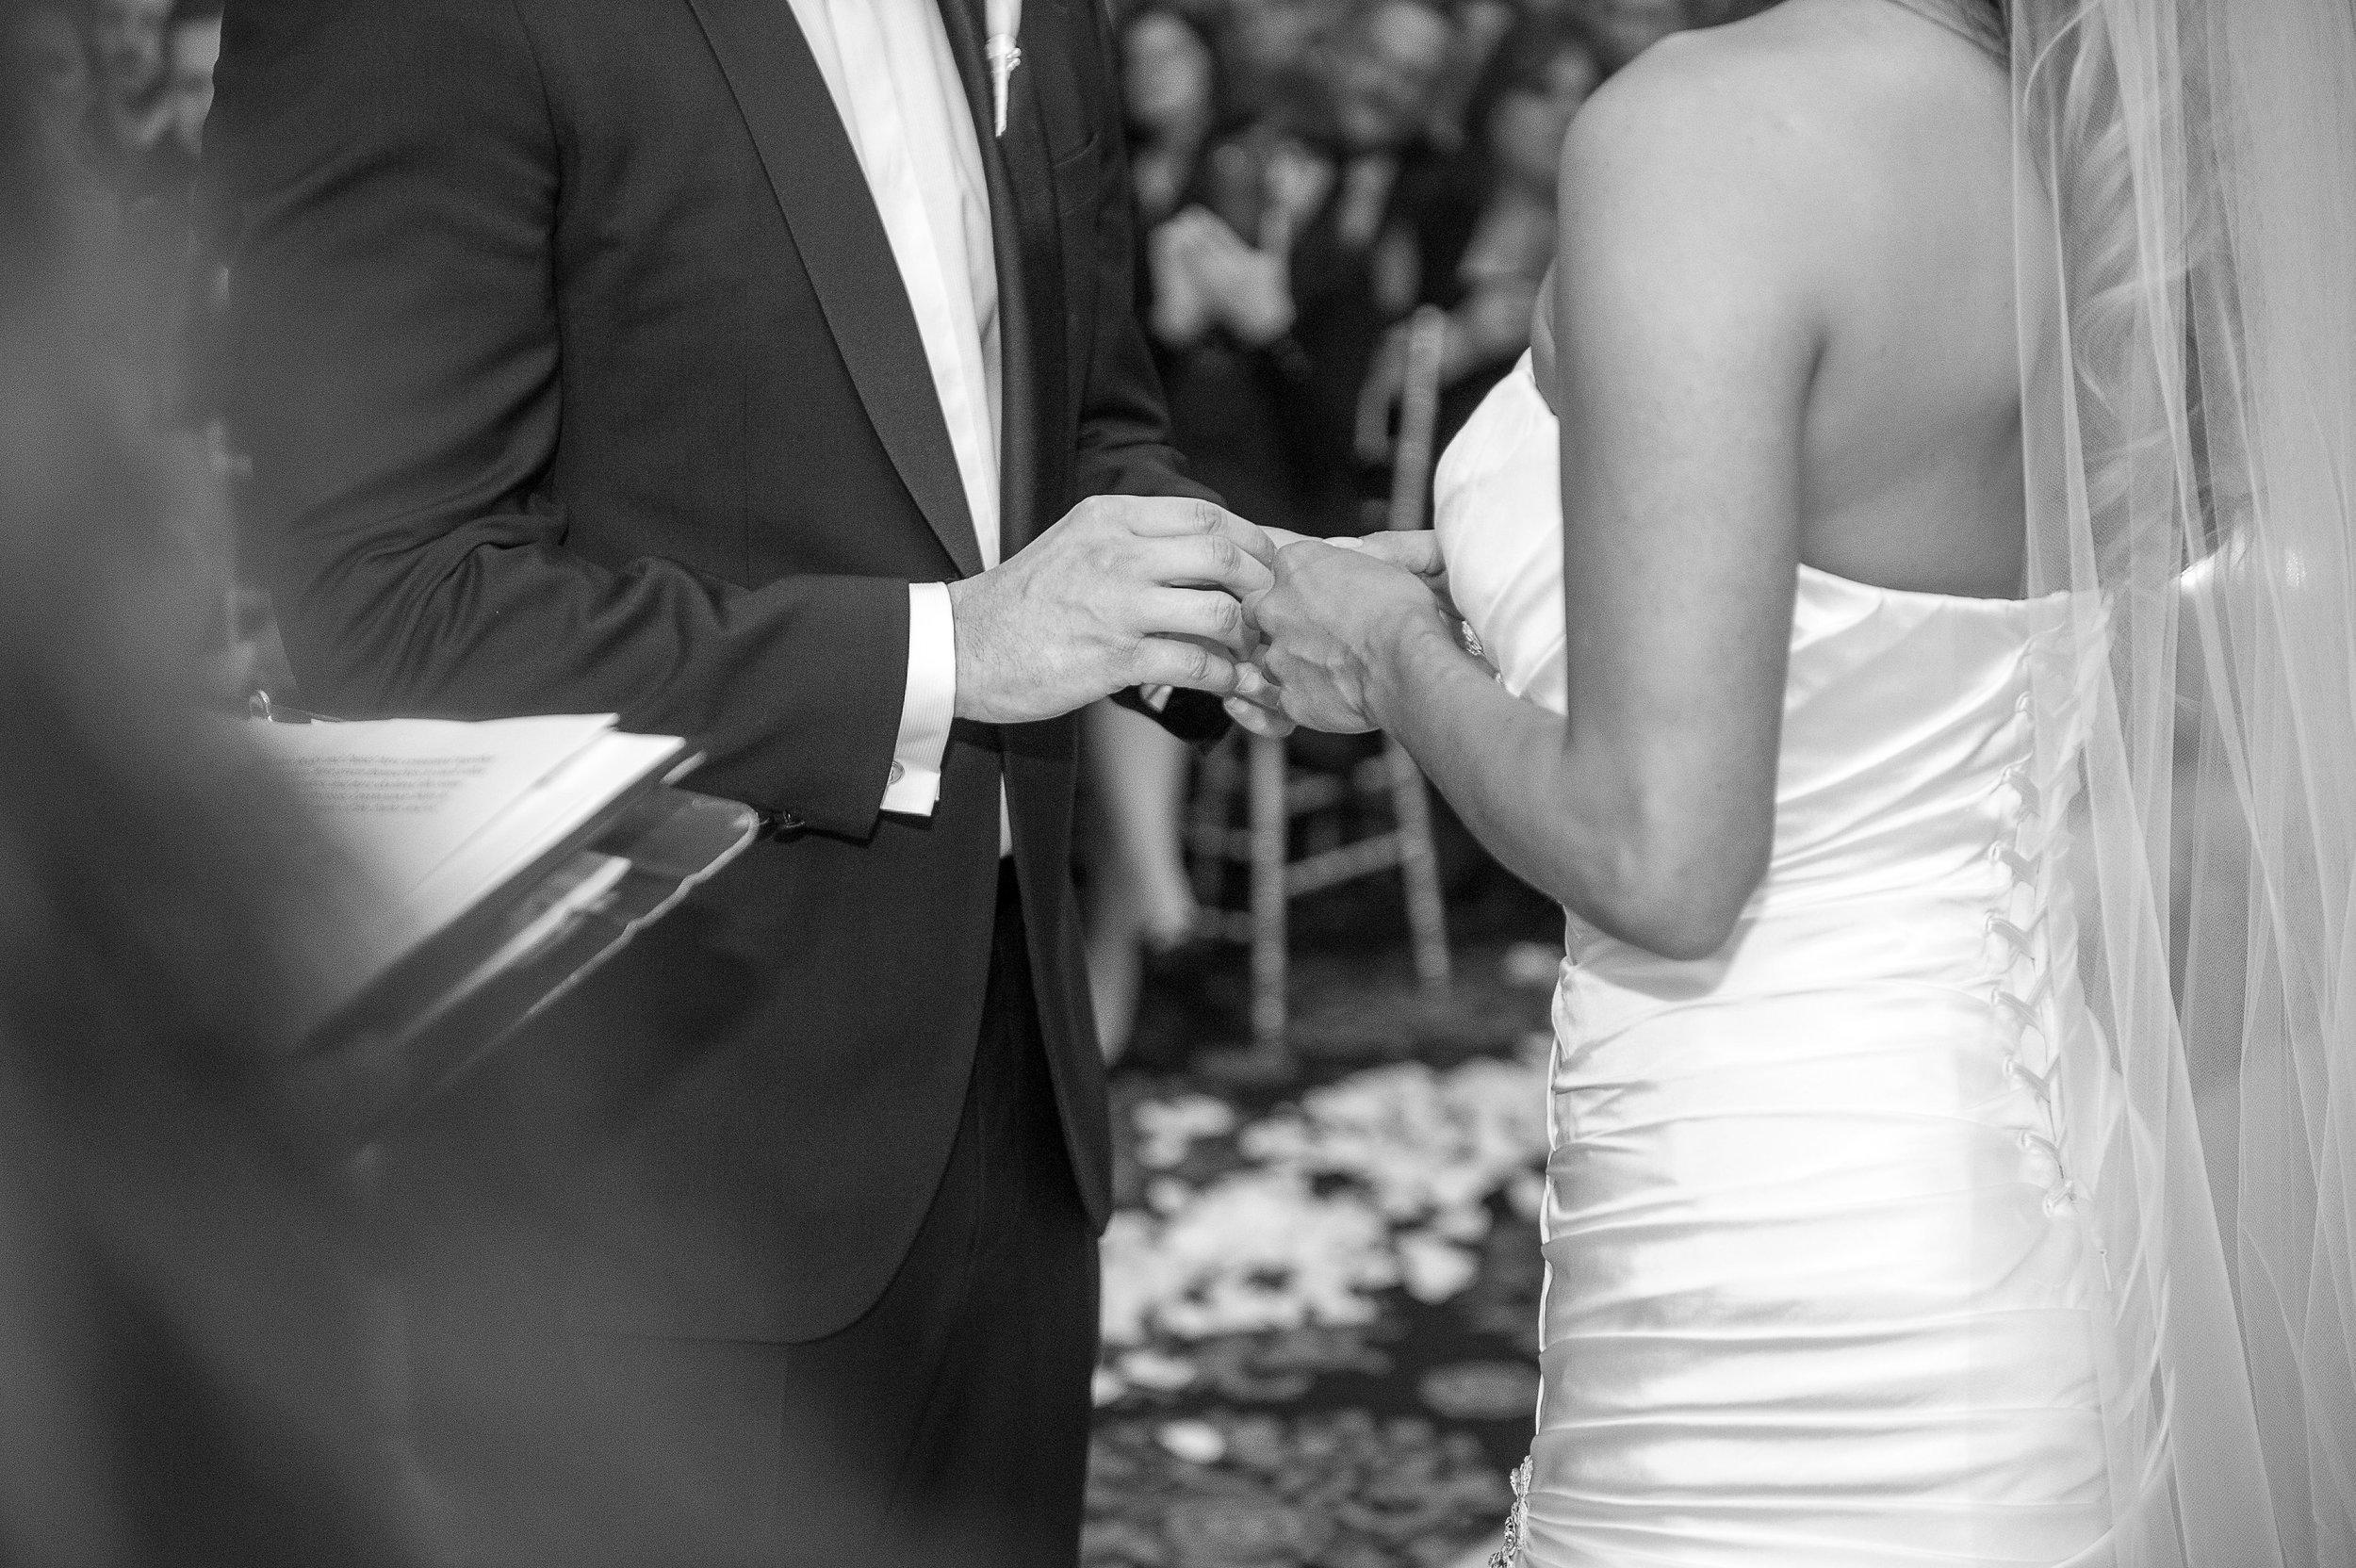 Ceci_New_York_Custom_Invitation_ New_Jersey_Wedding_Luxury_Personalized_Ceci_Style_Bride_Foil_Stamping110.JPG